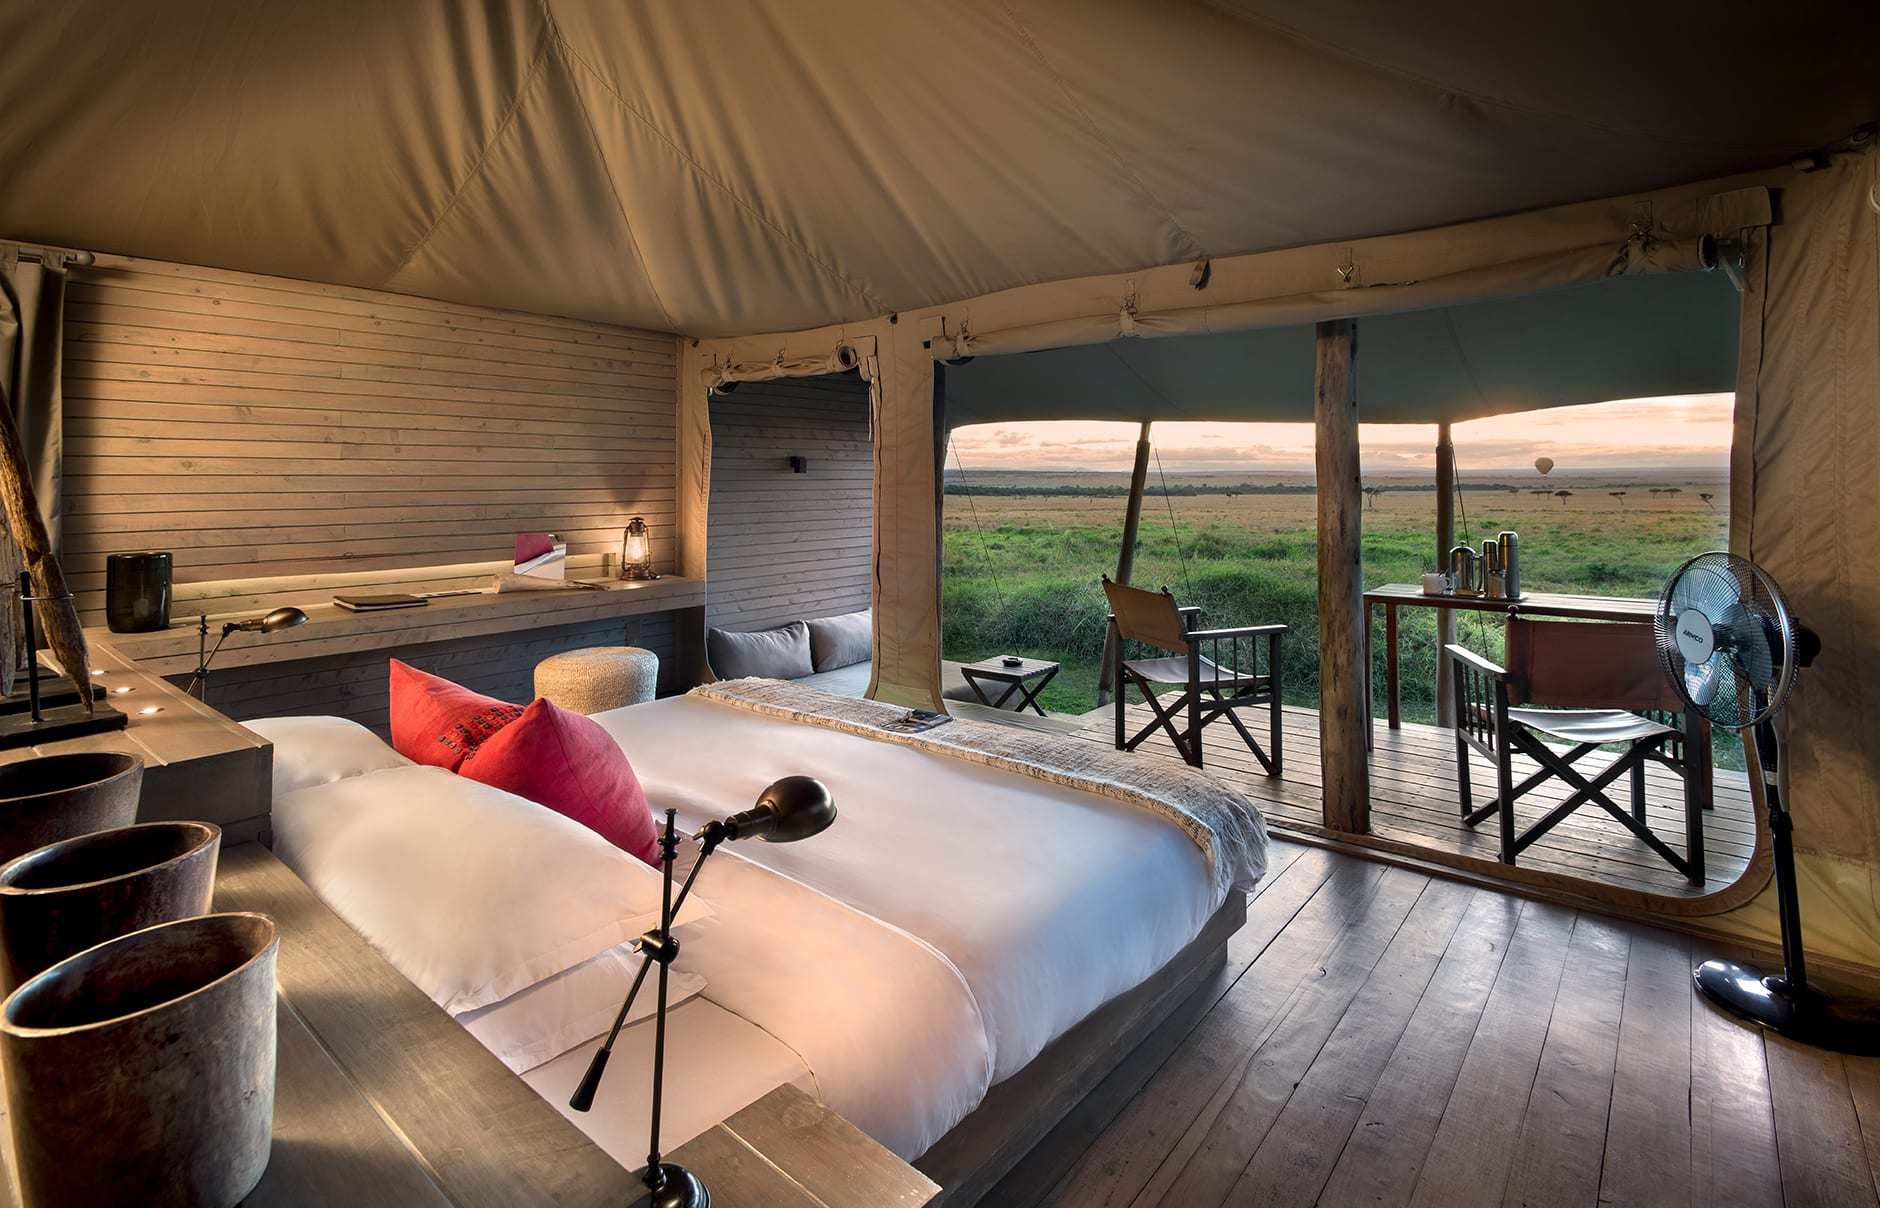 &Beyond Kichwa Tembo Tented Camp, Masai Mara, Kenya. Review by TravelPlusStyle. Photo © &Beyond